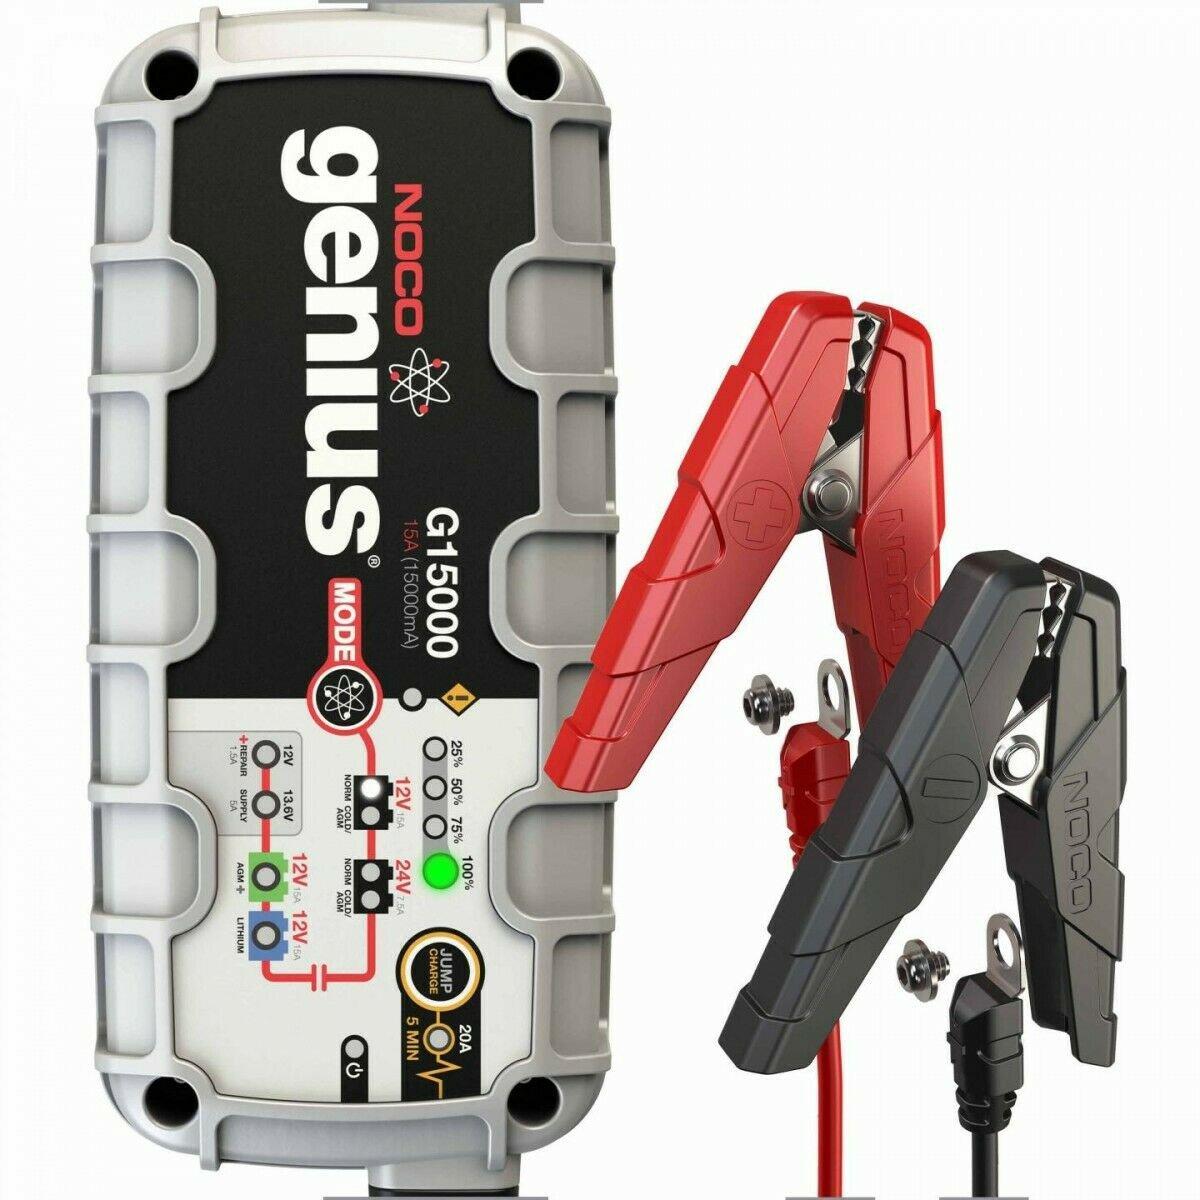 NOCO Genius G15000 12V/24V 15 Amp Battery Charger Maintainer Jump Starter